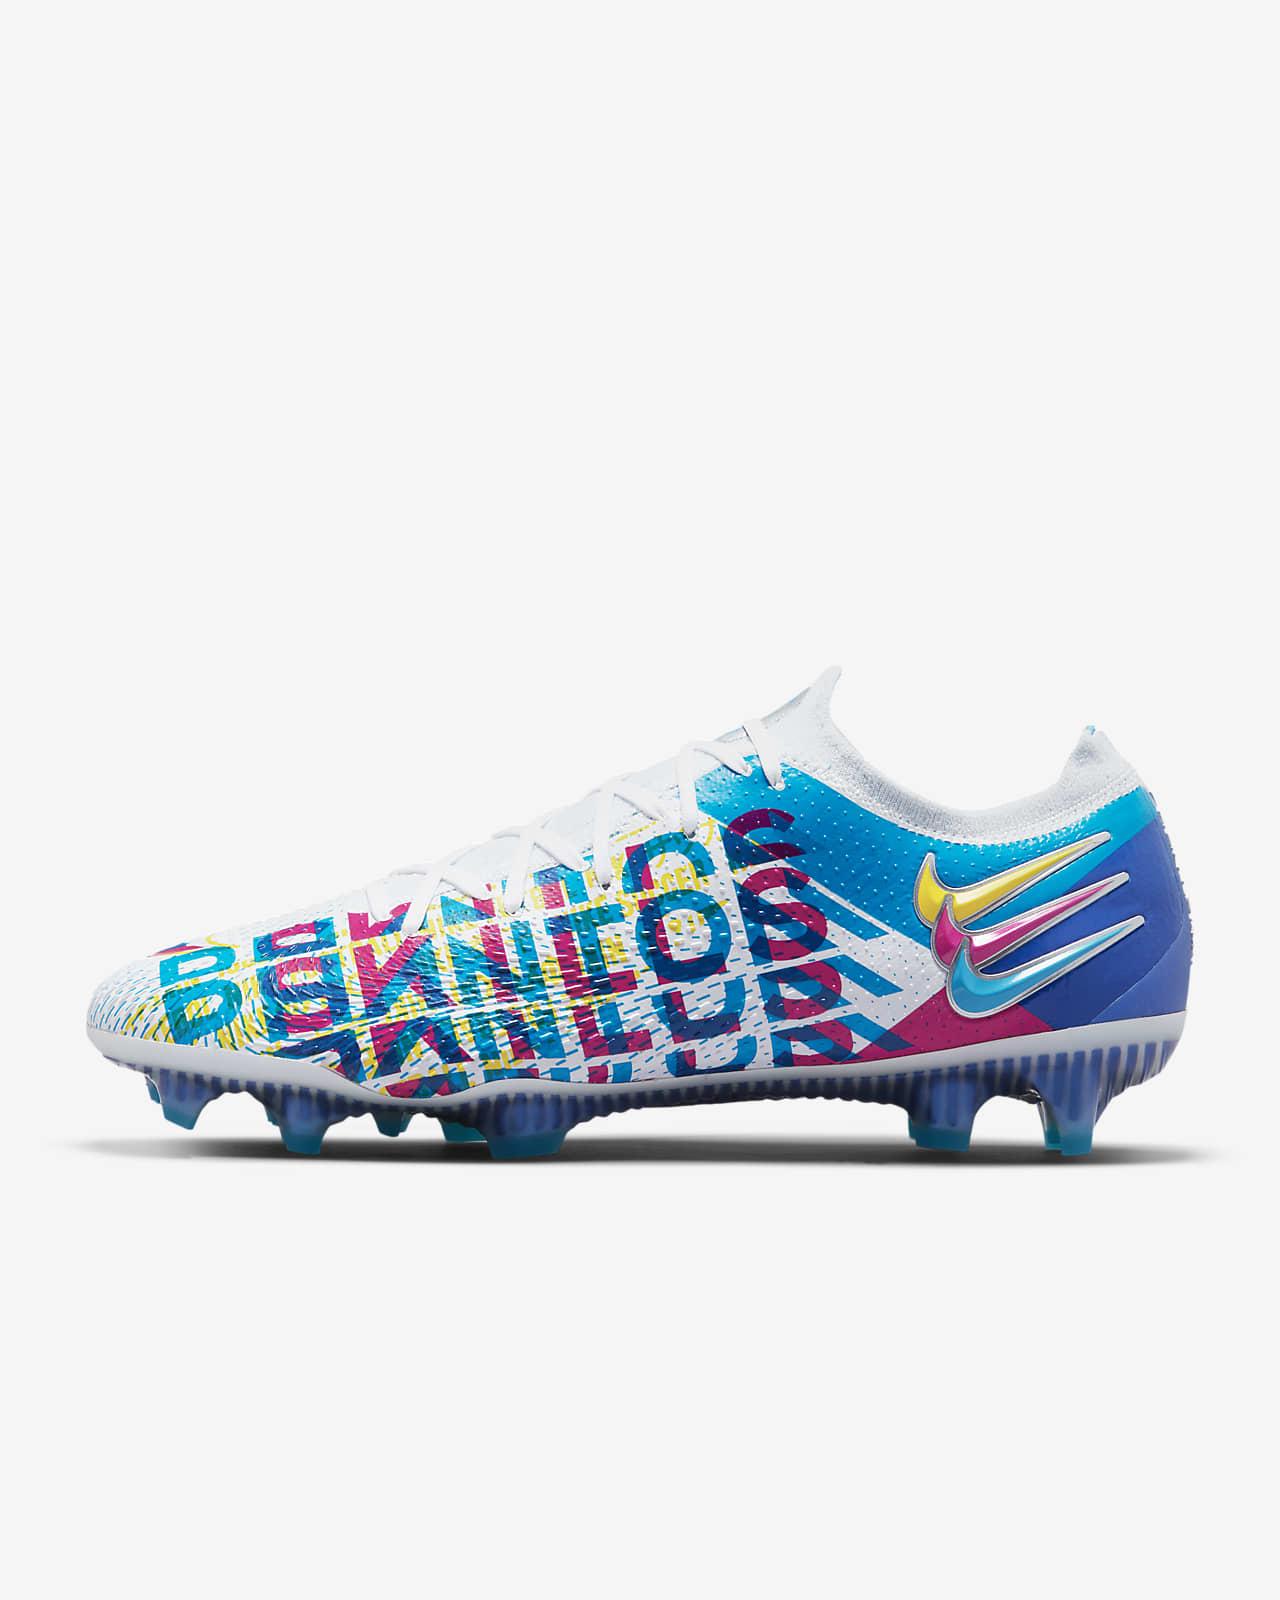 Calzado de fútbol para terreno firme Nike Phantom GT Elite 3D FG